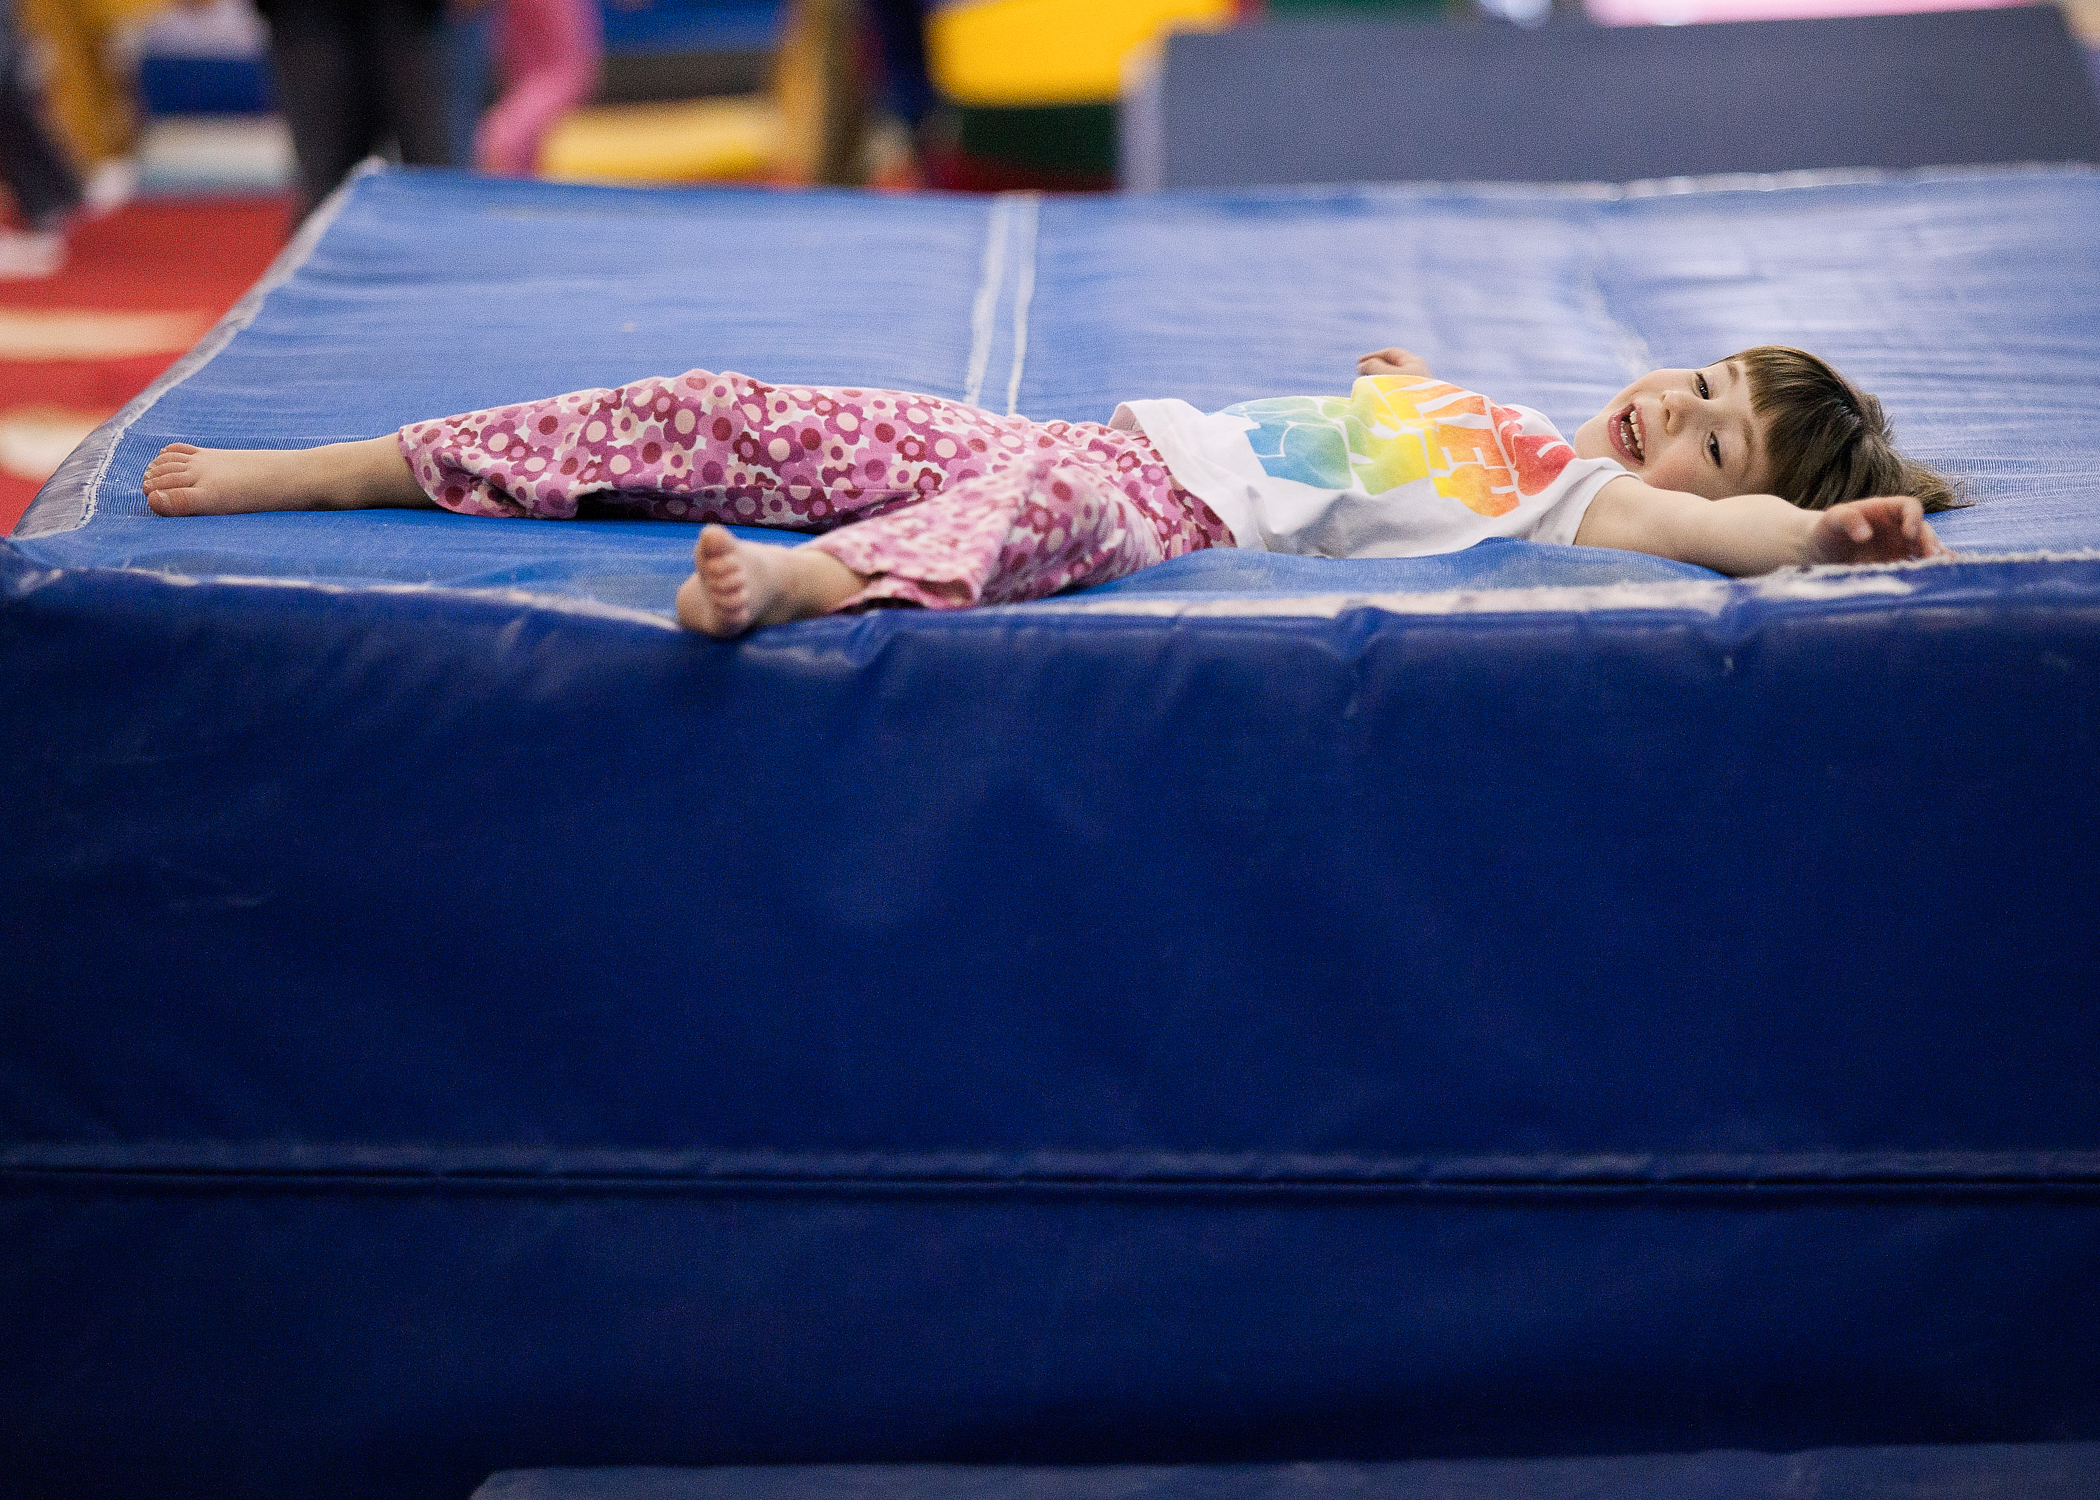 Maine_Academy_of_Gymnastics_0070-editPGforMAG.jpg